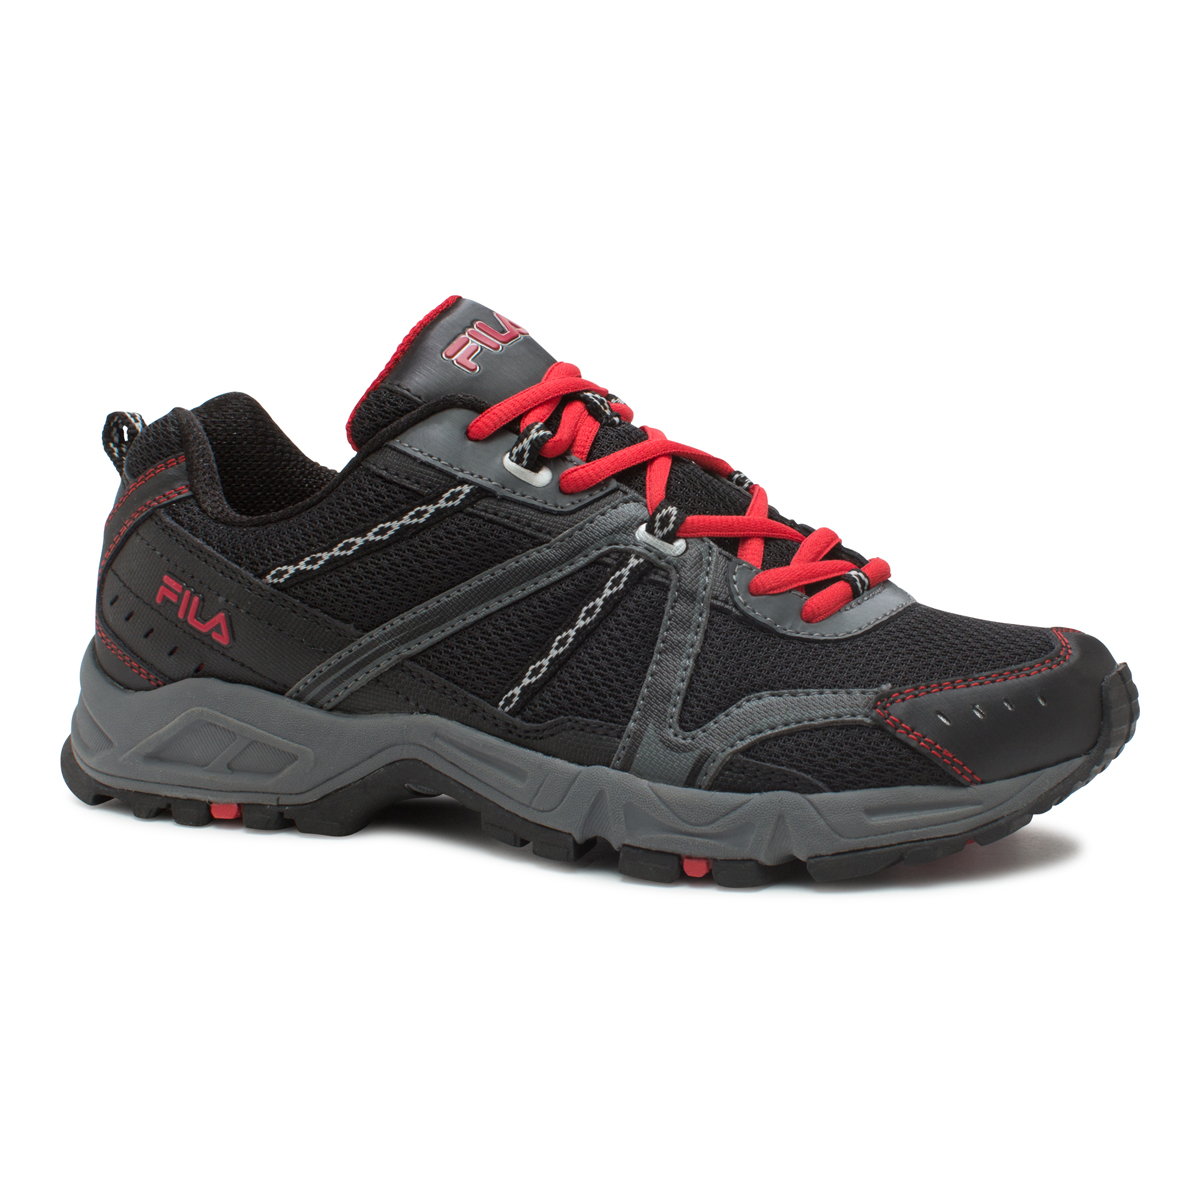 Fila Men Ascent 12 Sneakers by Fila